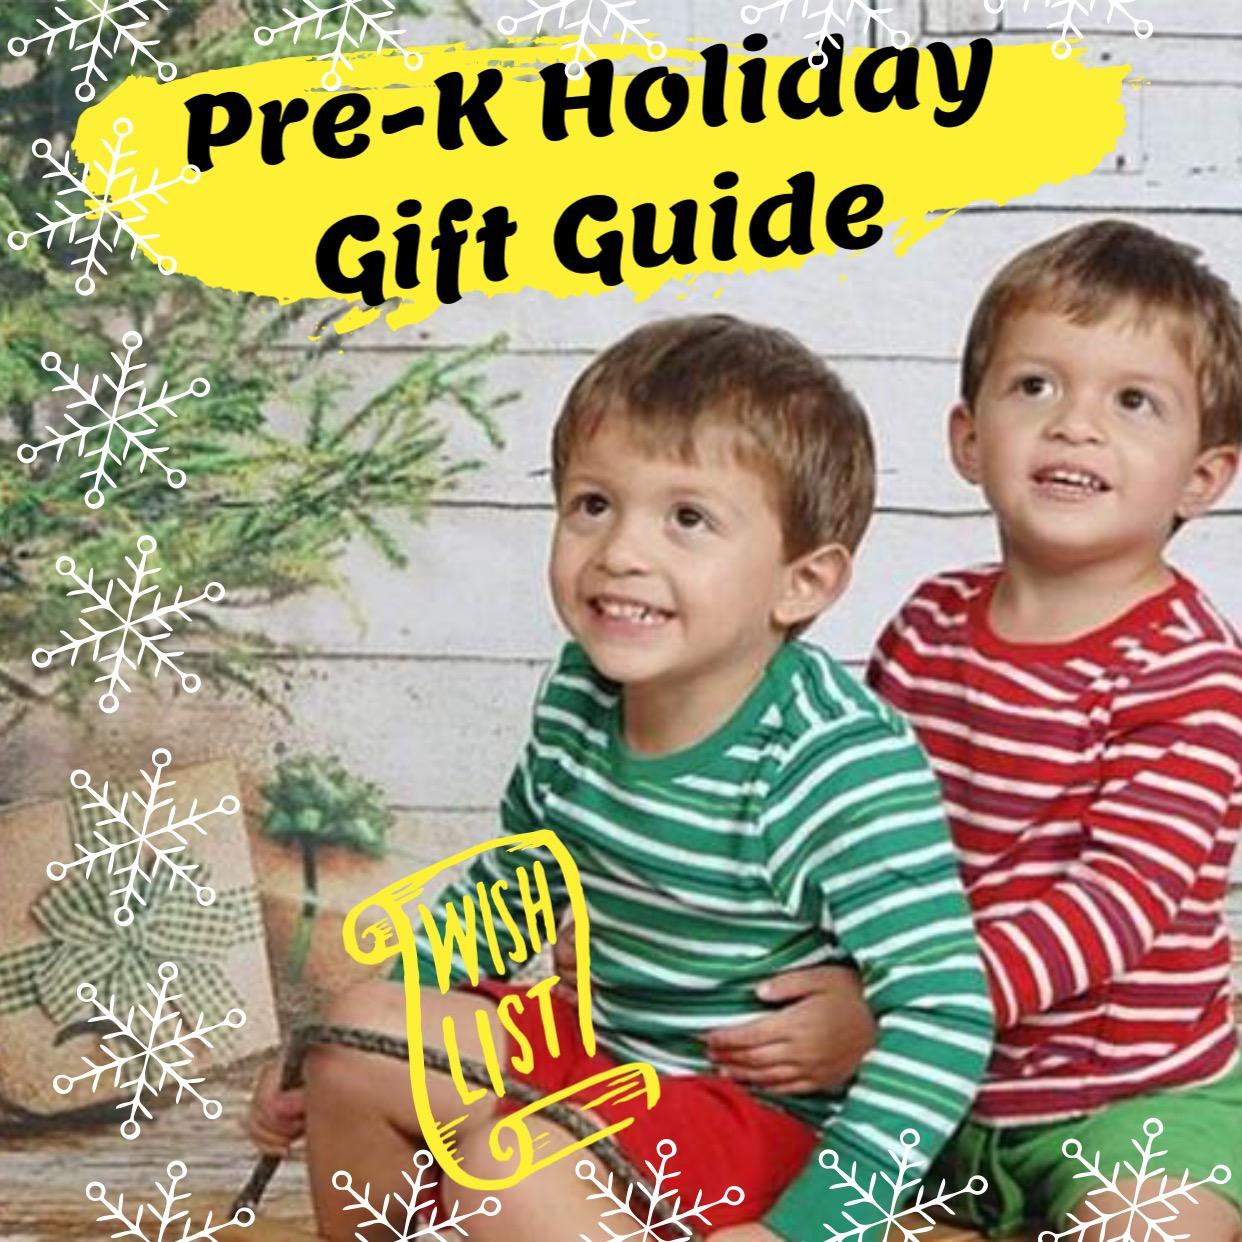 Pre-k christmas gift ideas